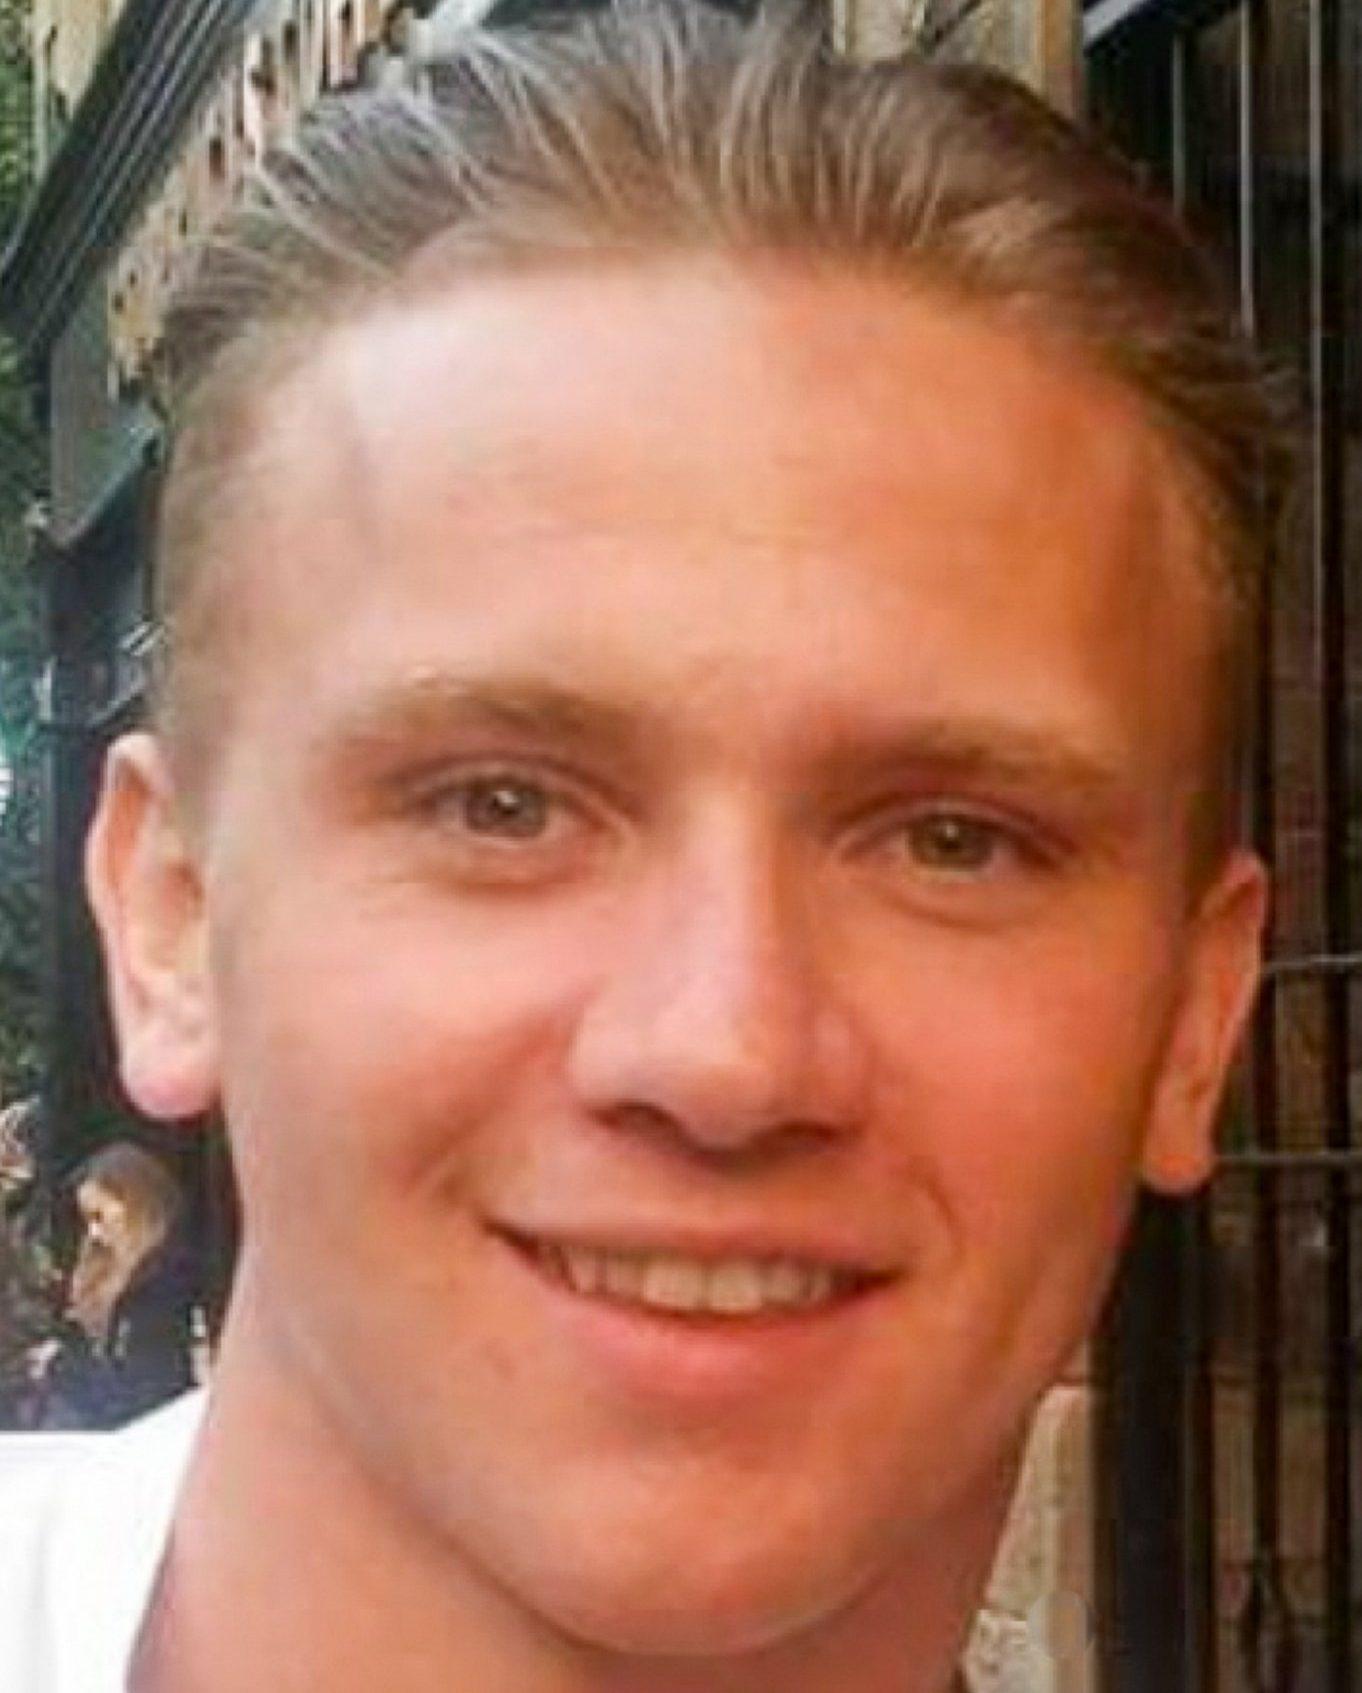 Dad of missing RAF gunner Corrie McKeague says his son is 'no longer missing'